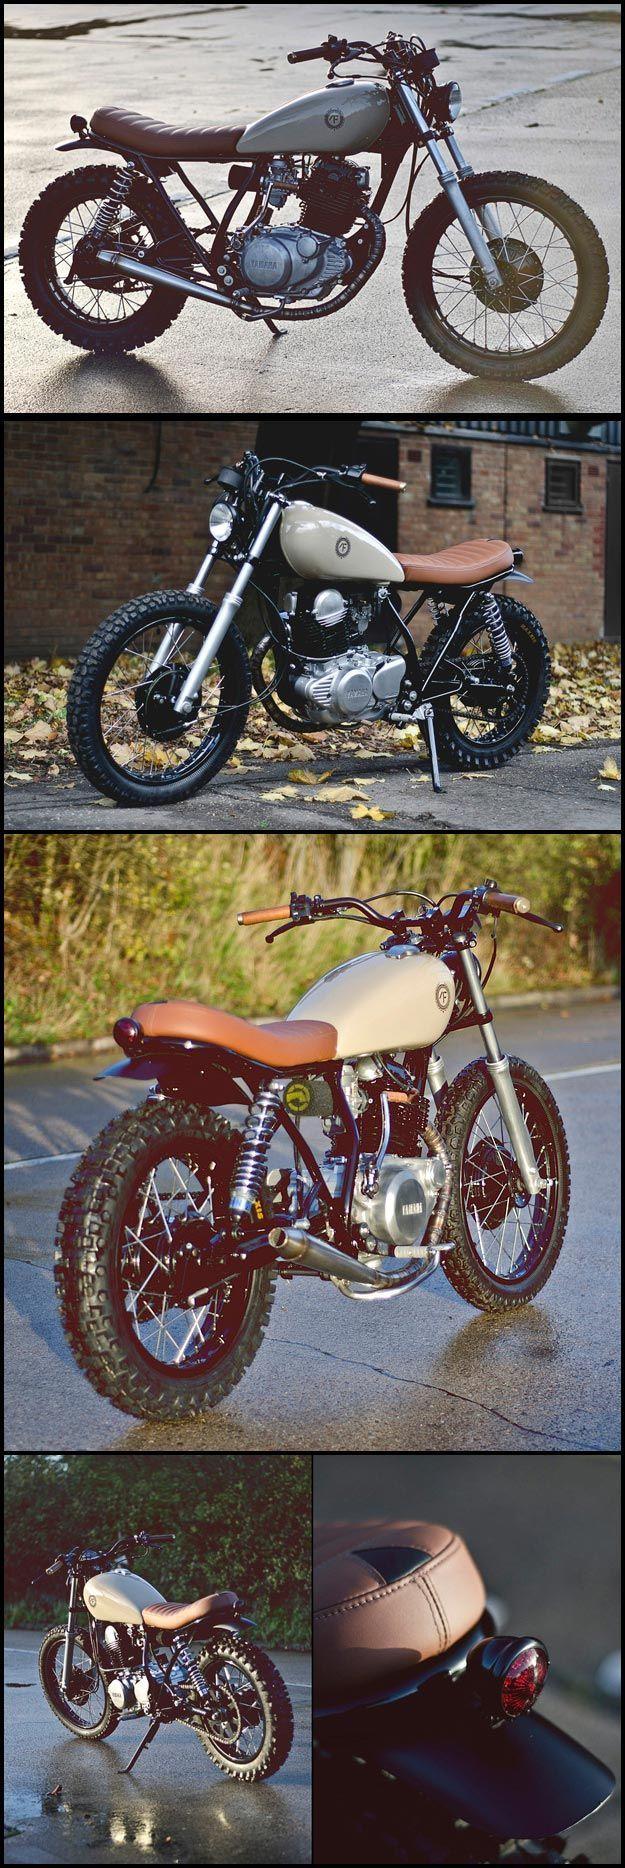 Yamaha SR250 by Auto Fabrica | Bike EXIF